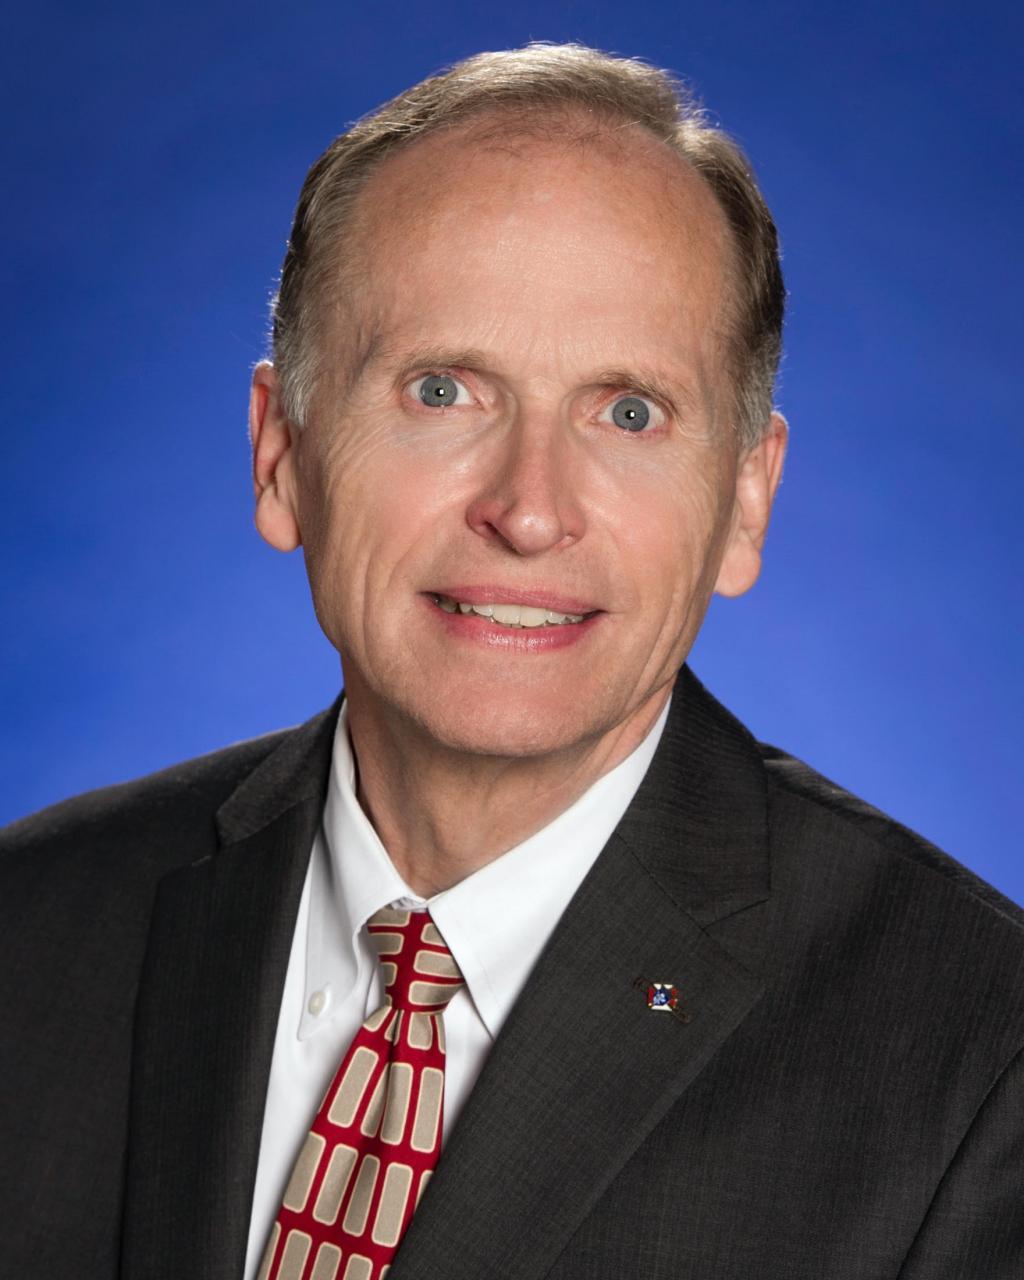 Mark McMullen